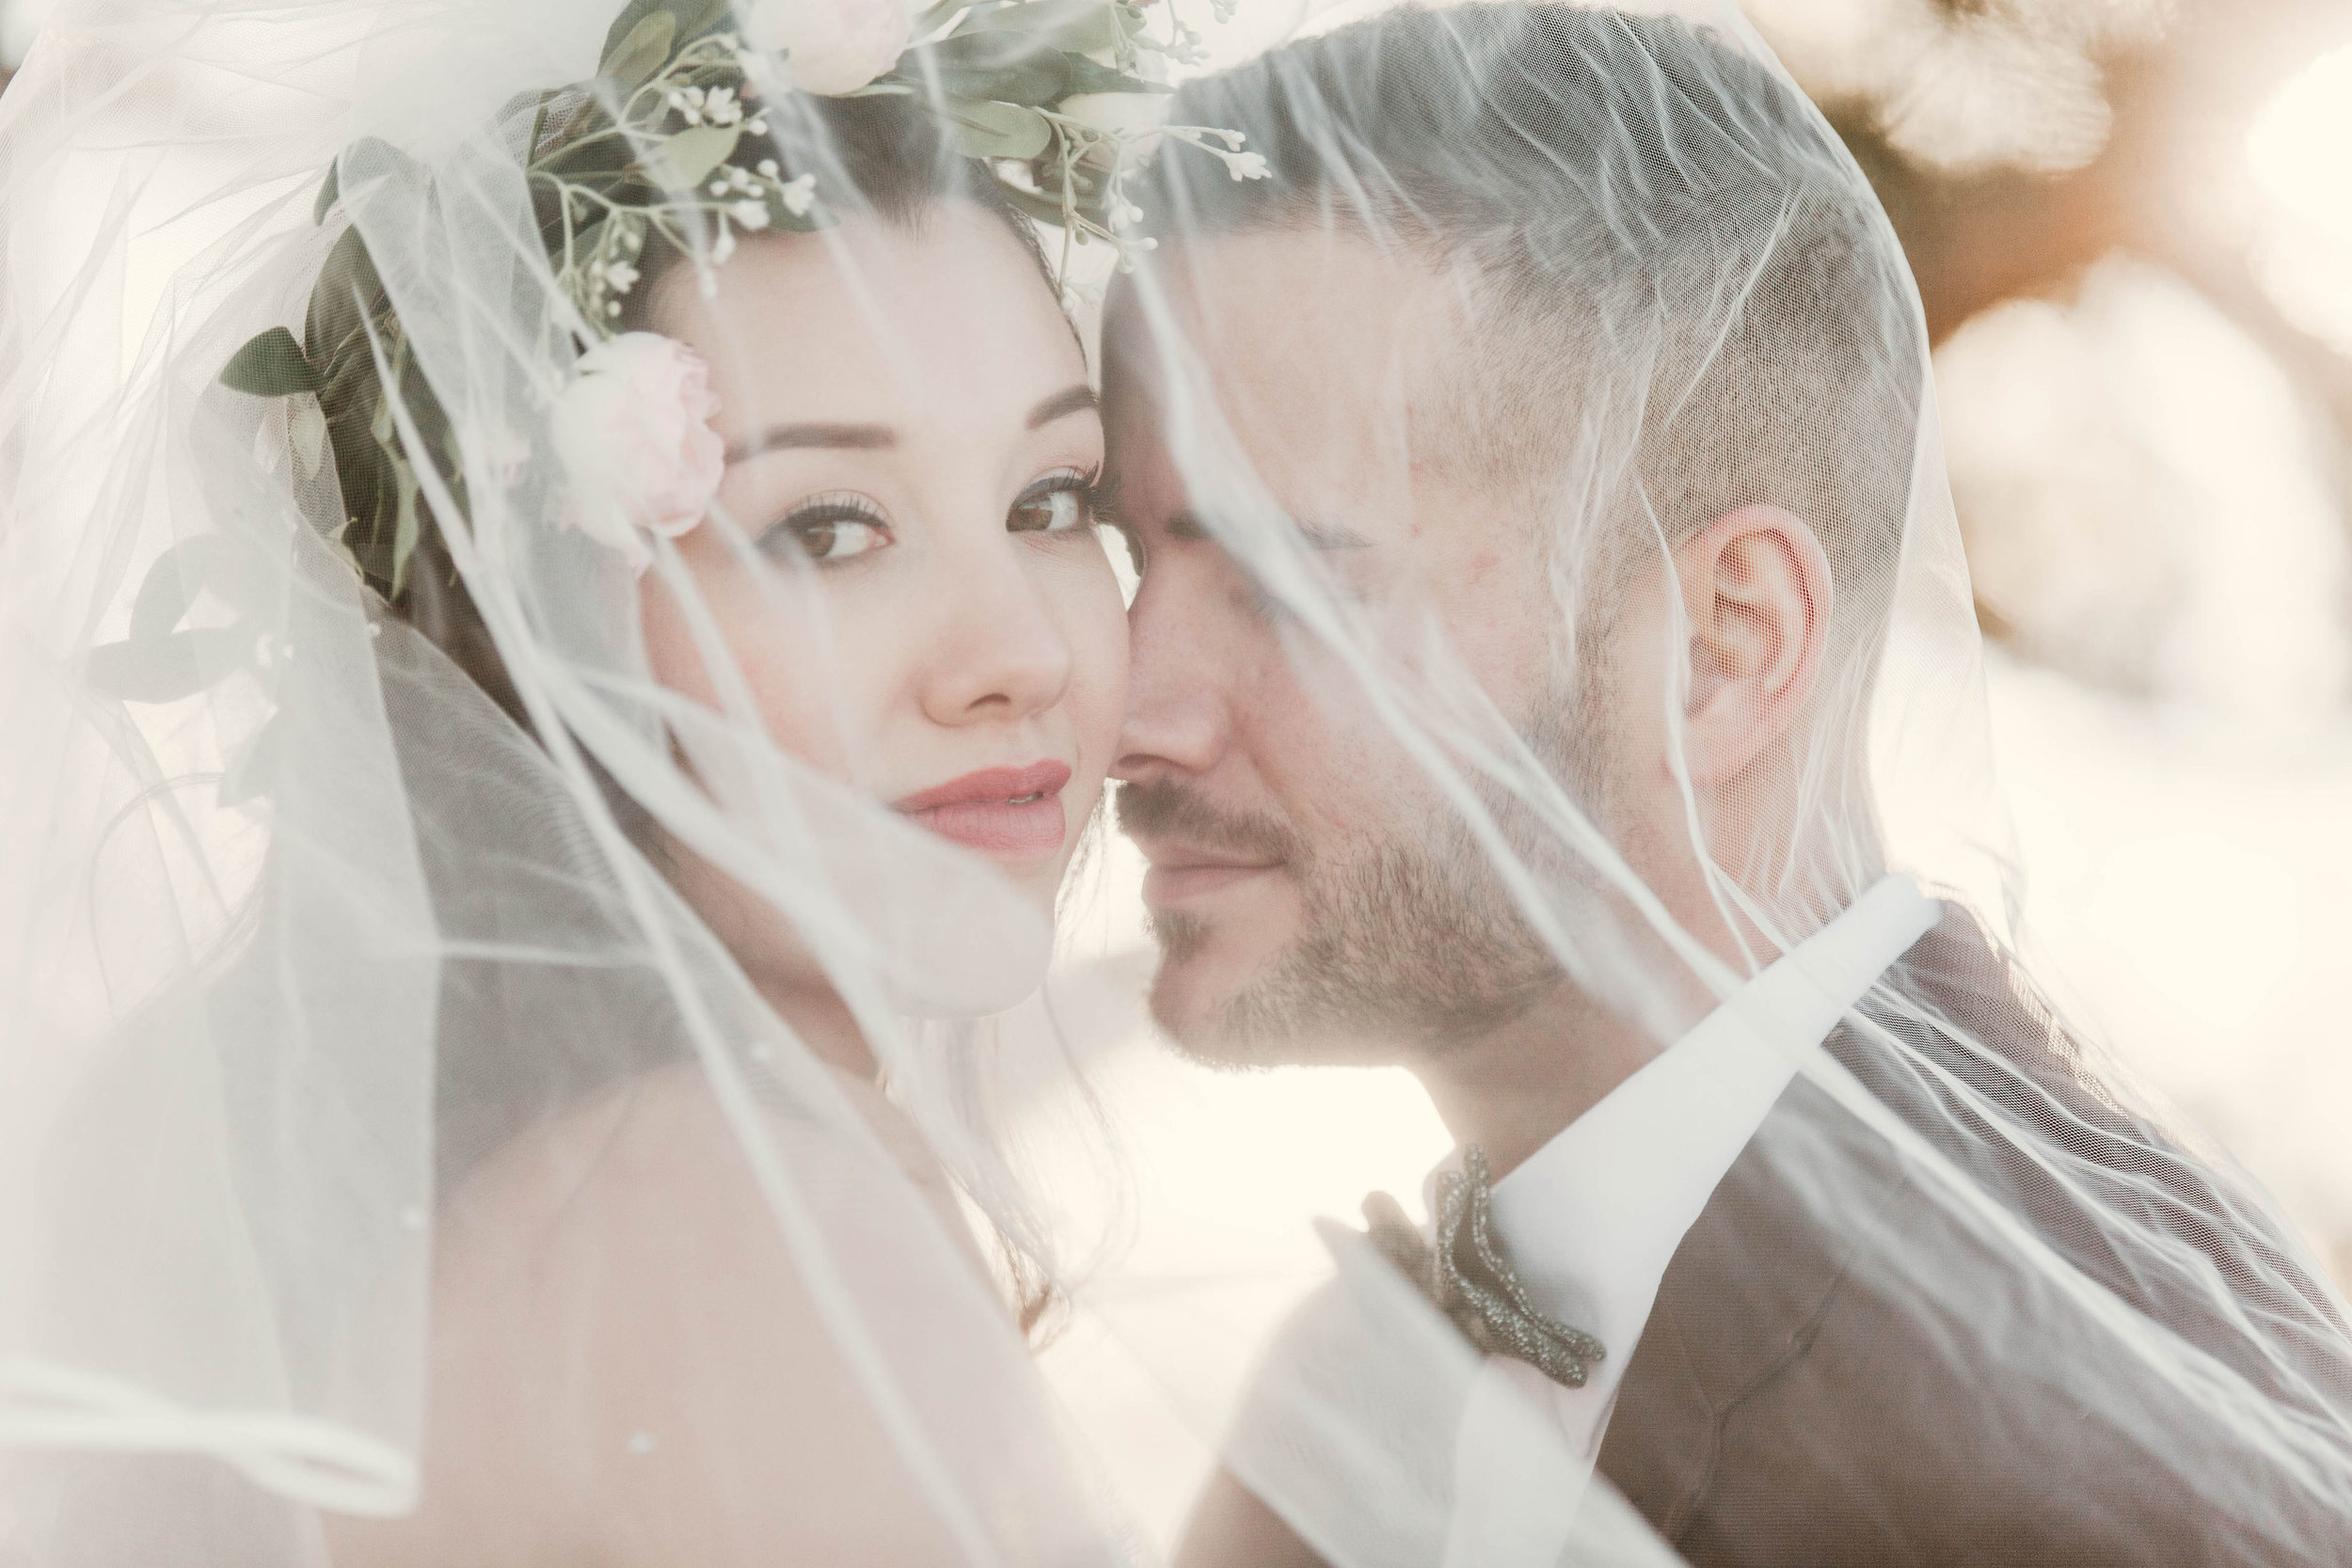 pinnacle-mountain-wedding-elopement-little-rock-arkansas-photographer-erin-venable-photography-bride-engagement-7117ps.jpg